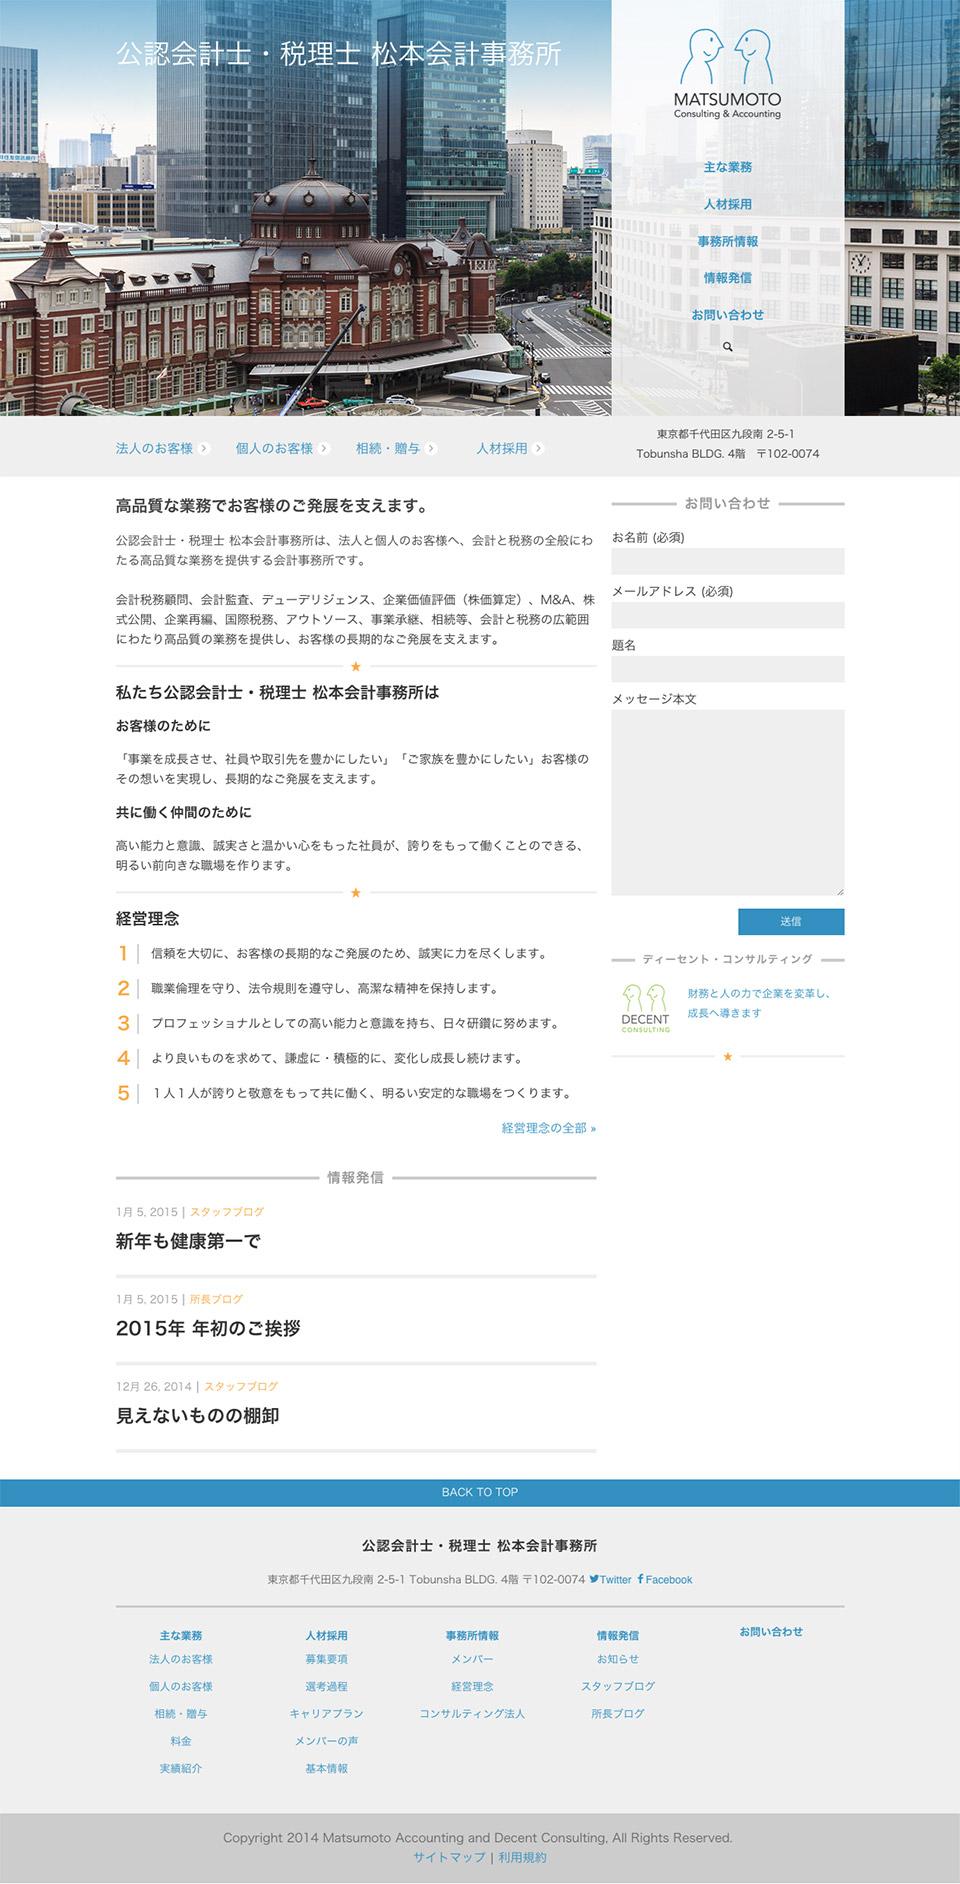 Matsumoto Accounting & Consulting - Homepage Desktop - Full Page - Menu Active